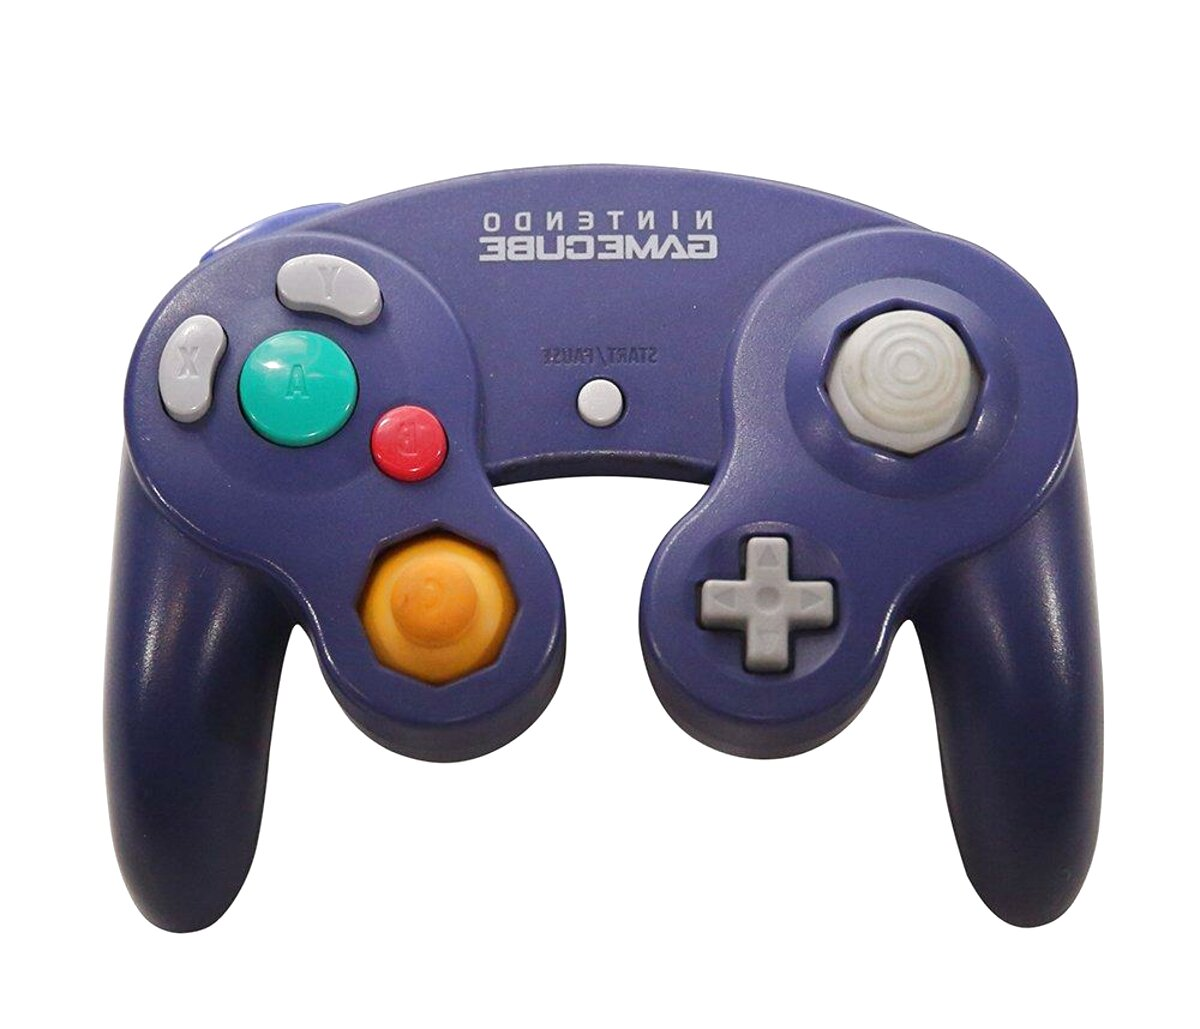 nintendo gamecube controller for sale